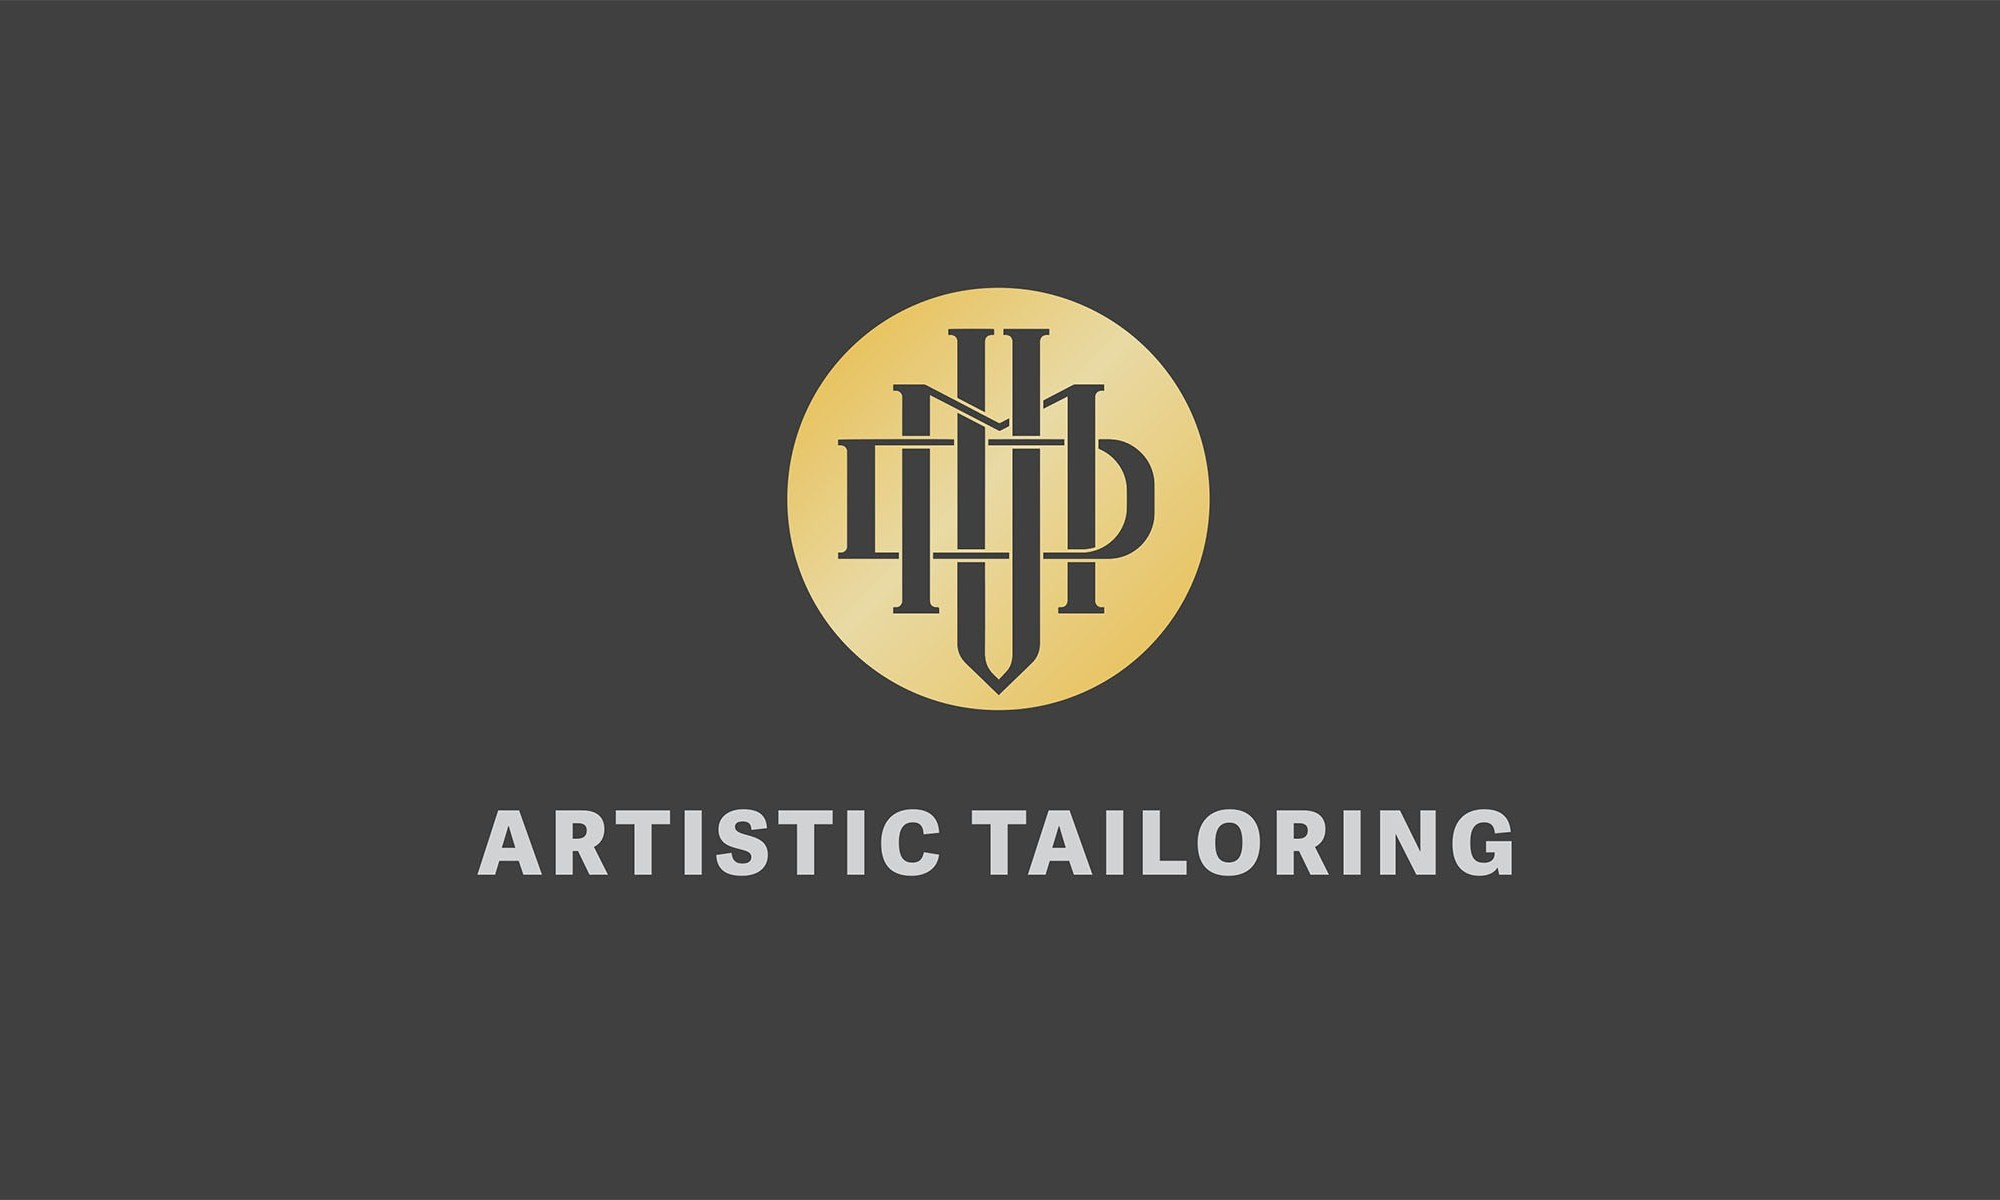 DMV Artistic Tailoring